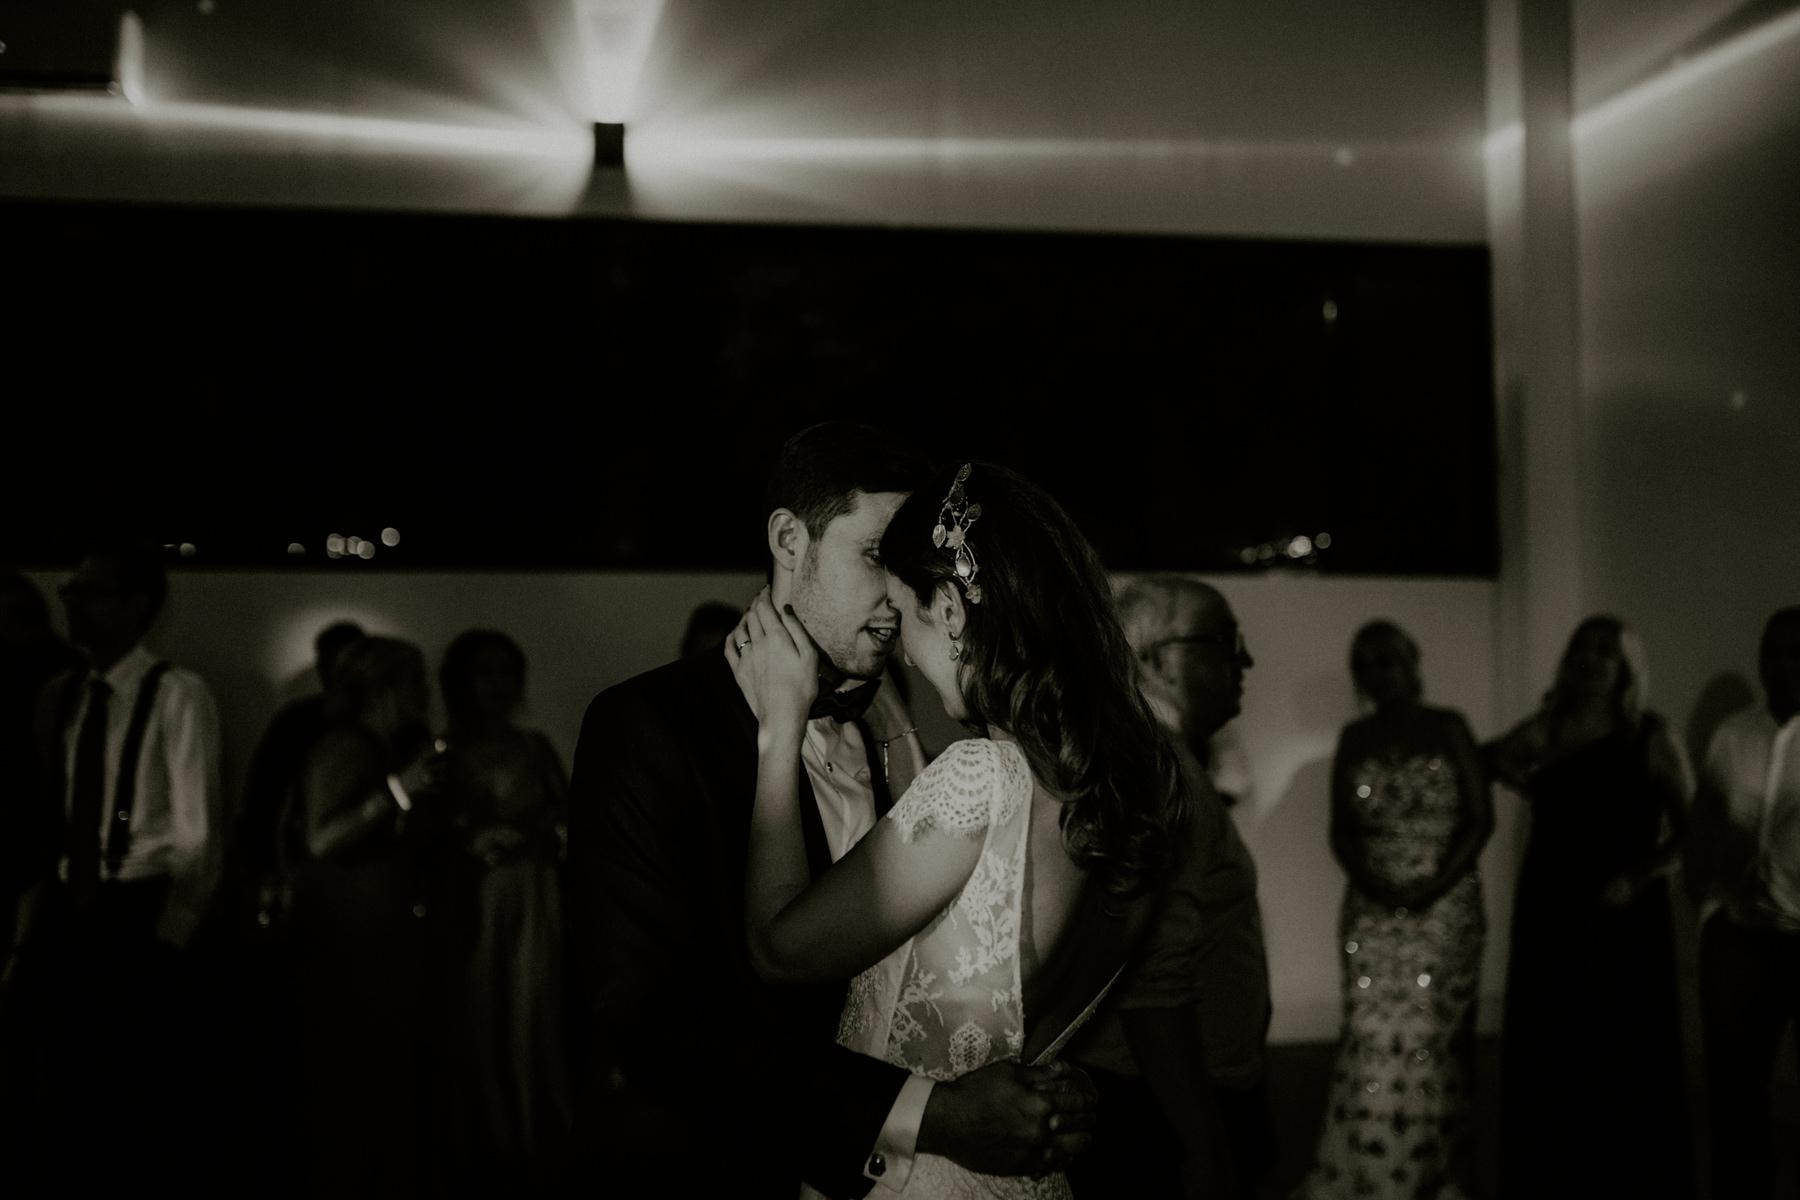 alt_thenortherngirlphotography_couples_weddingphotographer_photographer_wedding_boda_fotografodebodas_fotografobodasbarcelona_bodaindie_bodasconestilo_bodaensantperedeclara_jennifermiguel-955.jpg